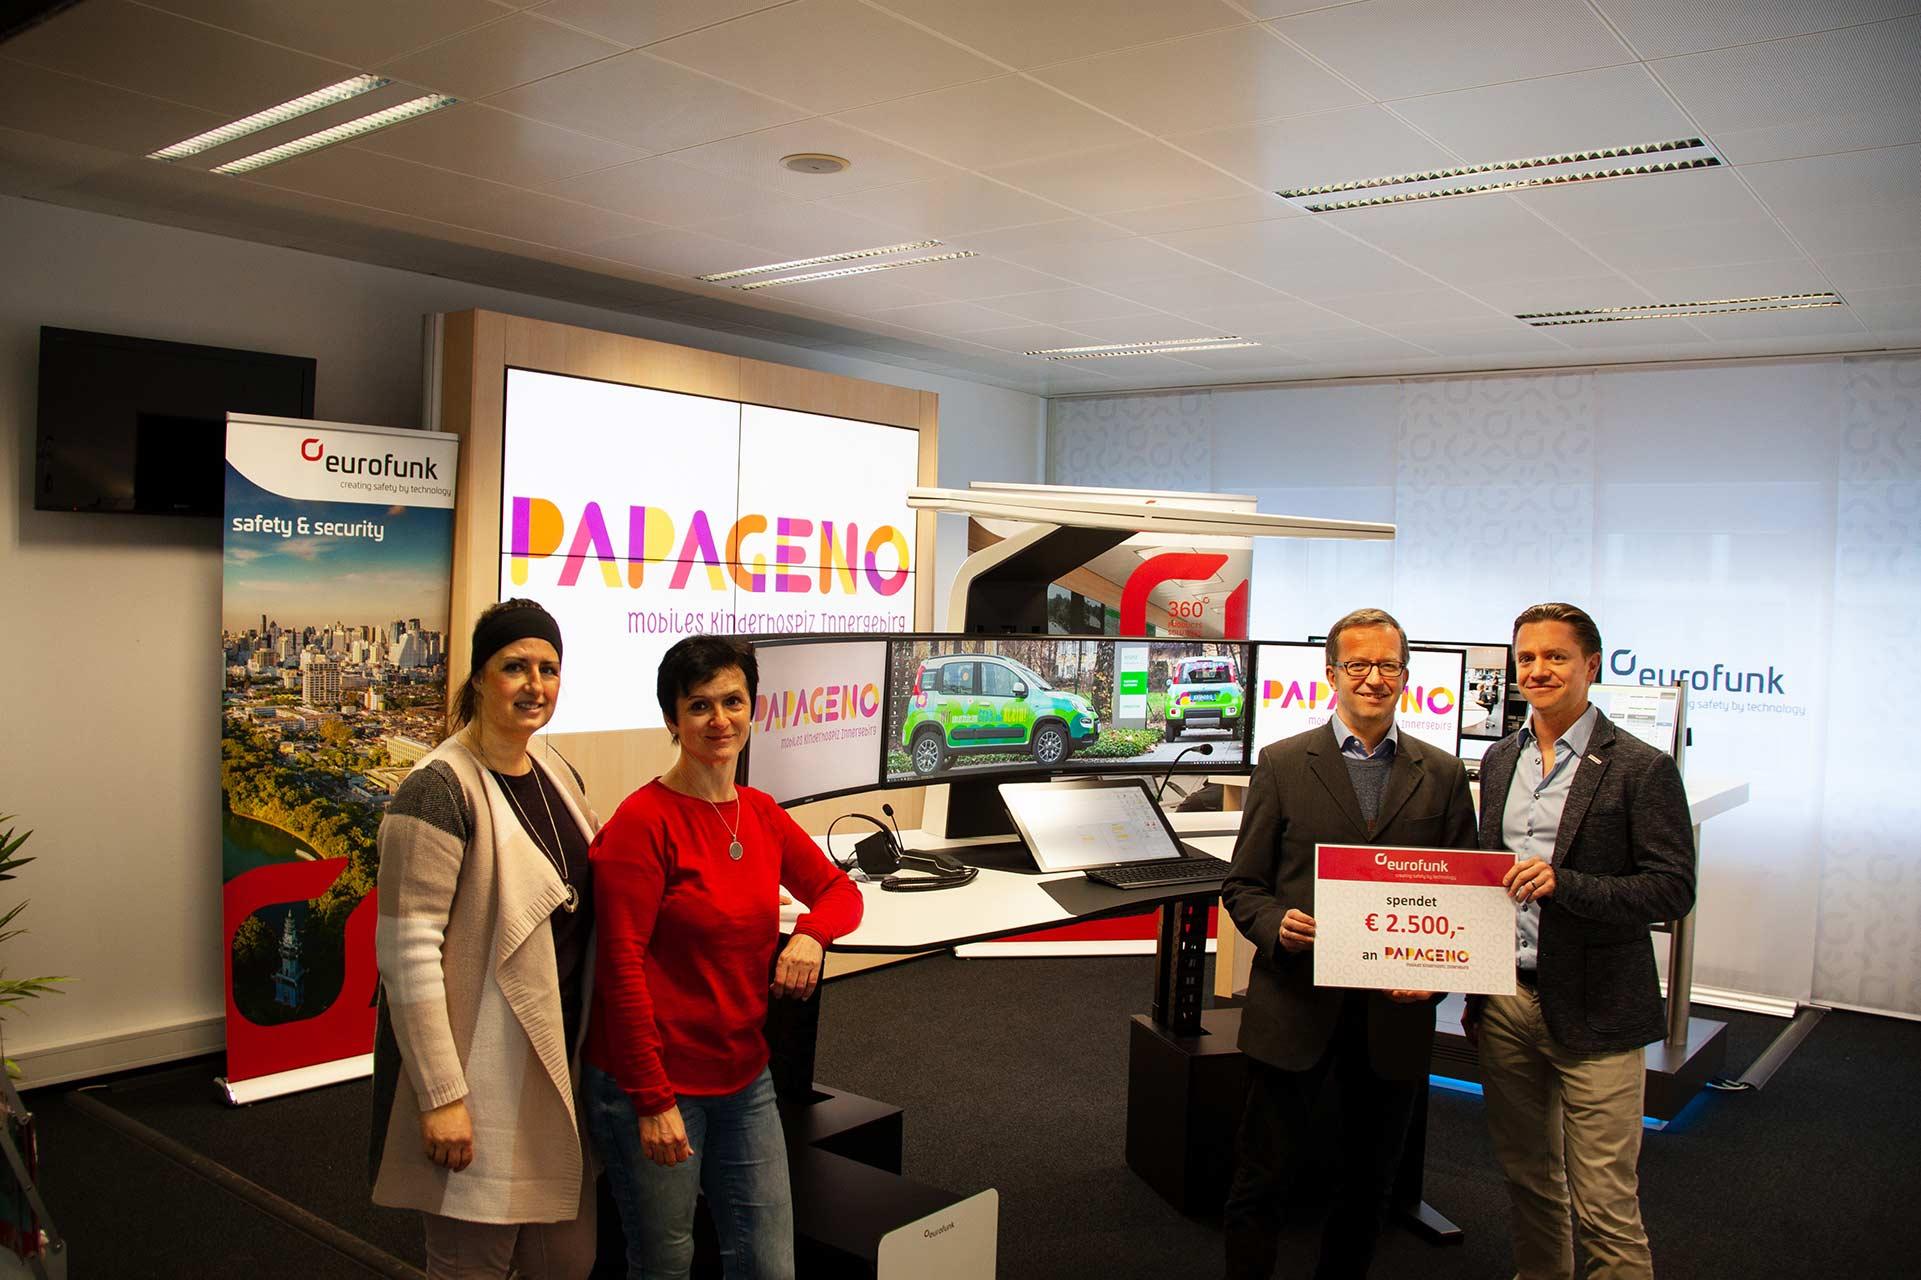 eurofunk spendet € 2.500,- an PAPAGENO Mobiles Kinderhospiz Innergebirg